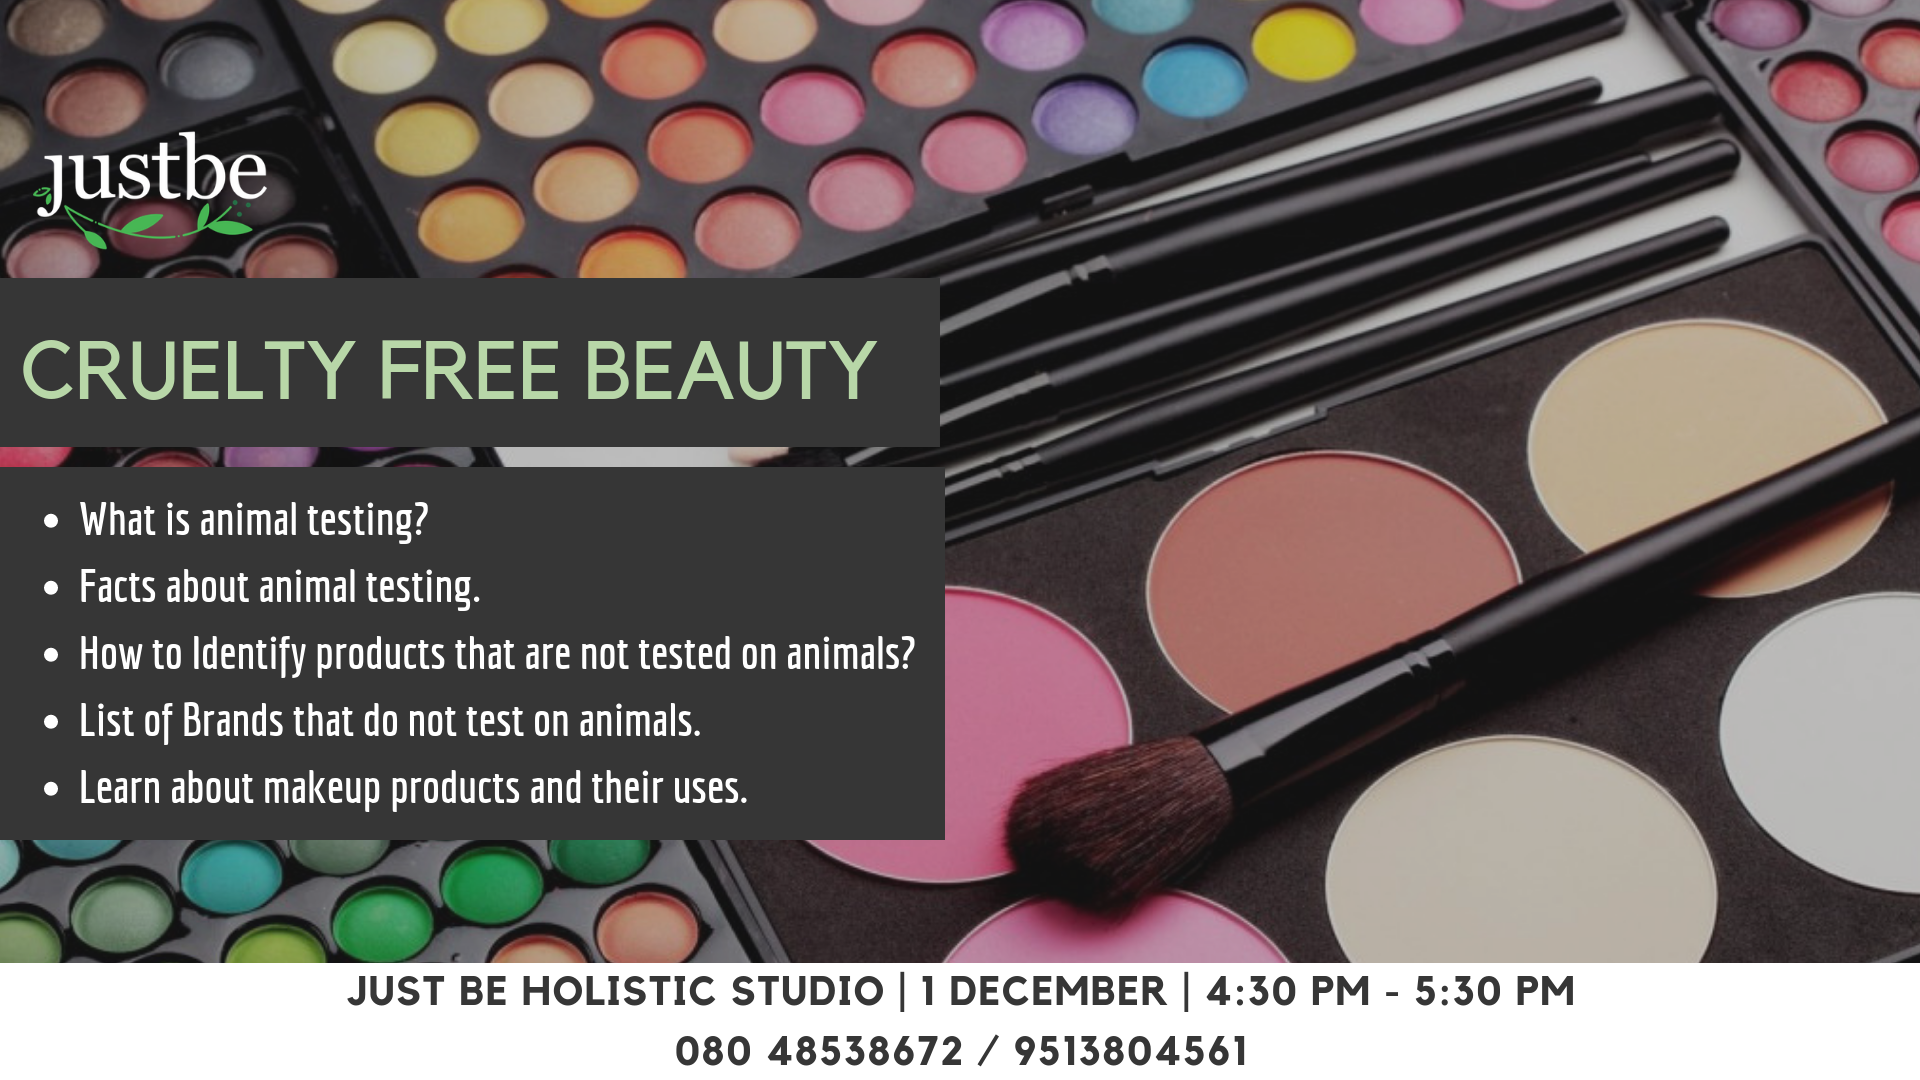 Cruelty Free Beauty